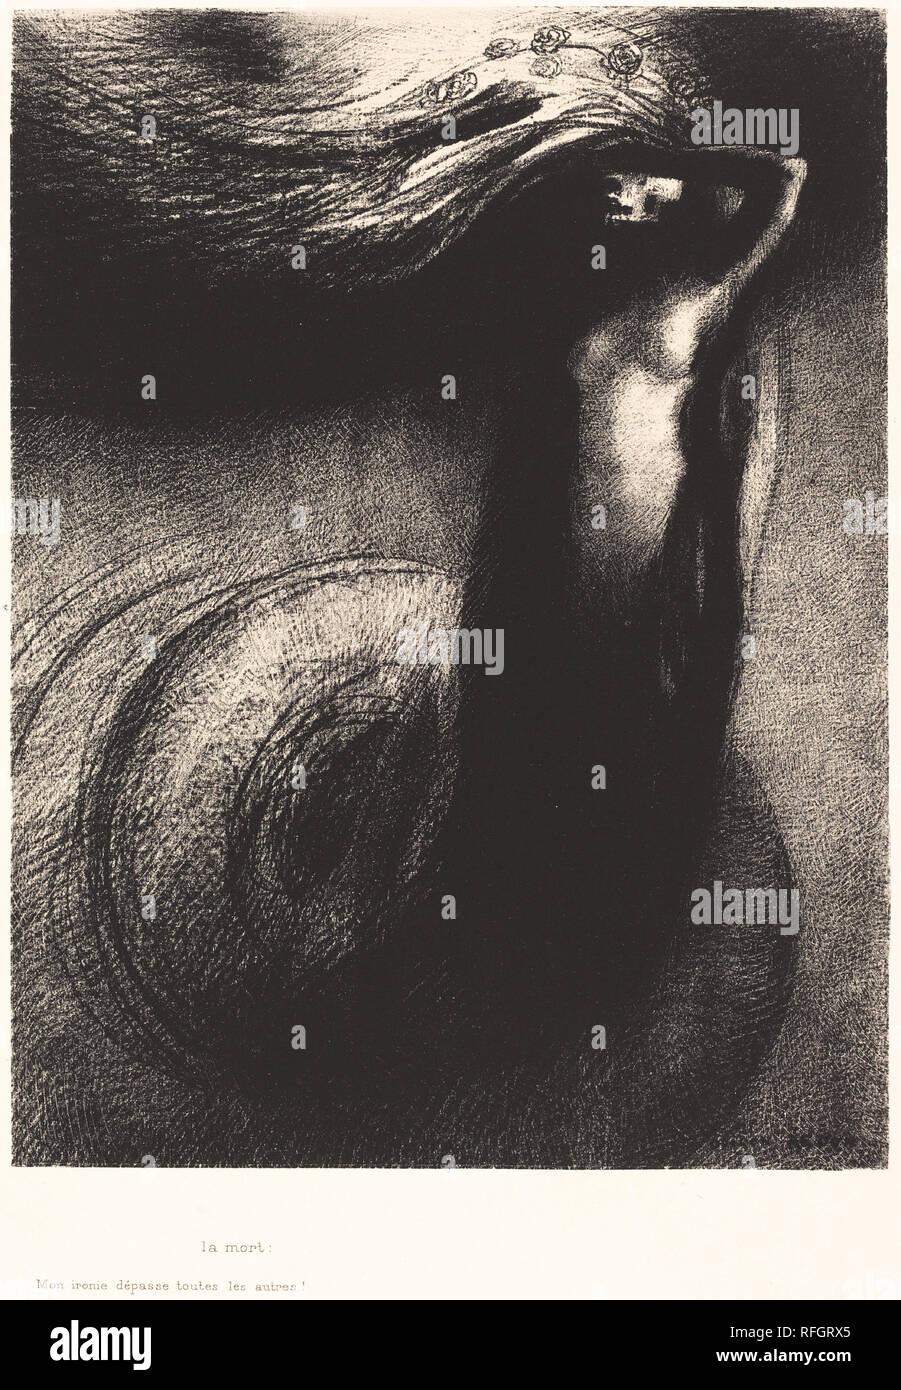 La Mort: Mon ironie depasse toutes les autres! (Death: My iron surpasses all others!). Dated: 1889. Medium: lithograph. Museum: National Gallery of Art, Washington DC. Author: Odilon Redon. - Stock Image